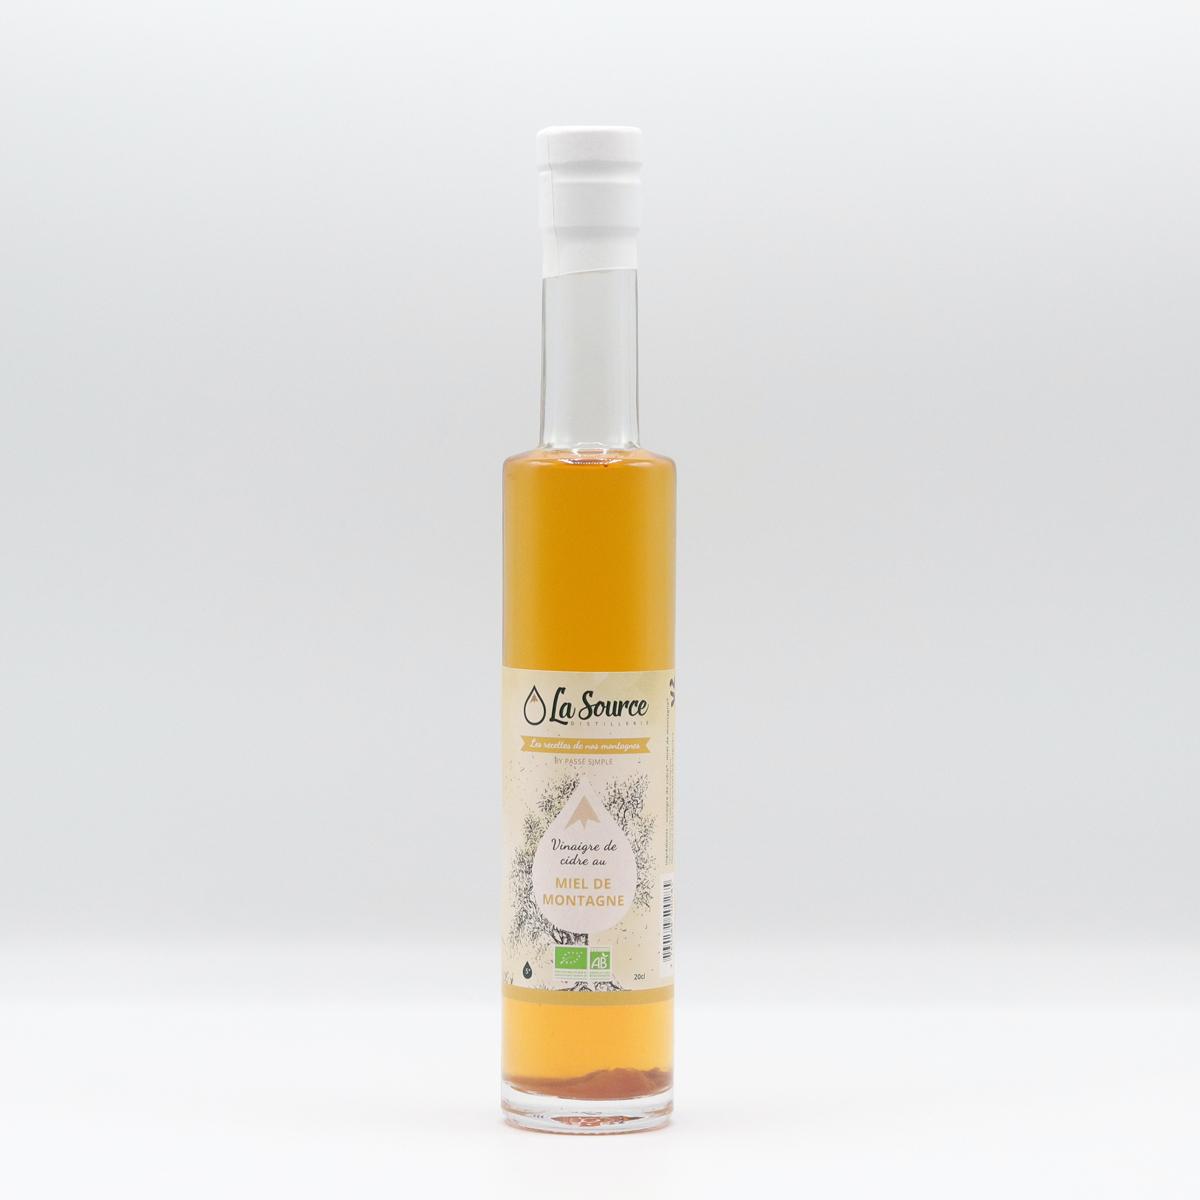 https://www.lasource-distillerie.fr/wp-content/uploads/2020/04/vinaigre-miel.jpg